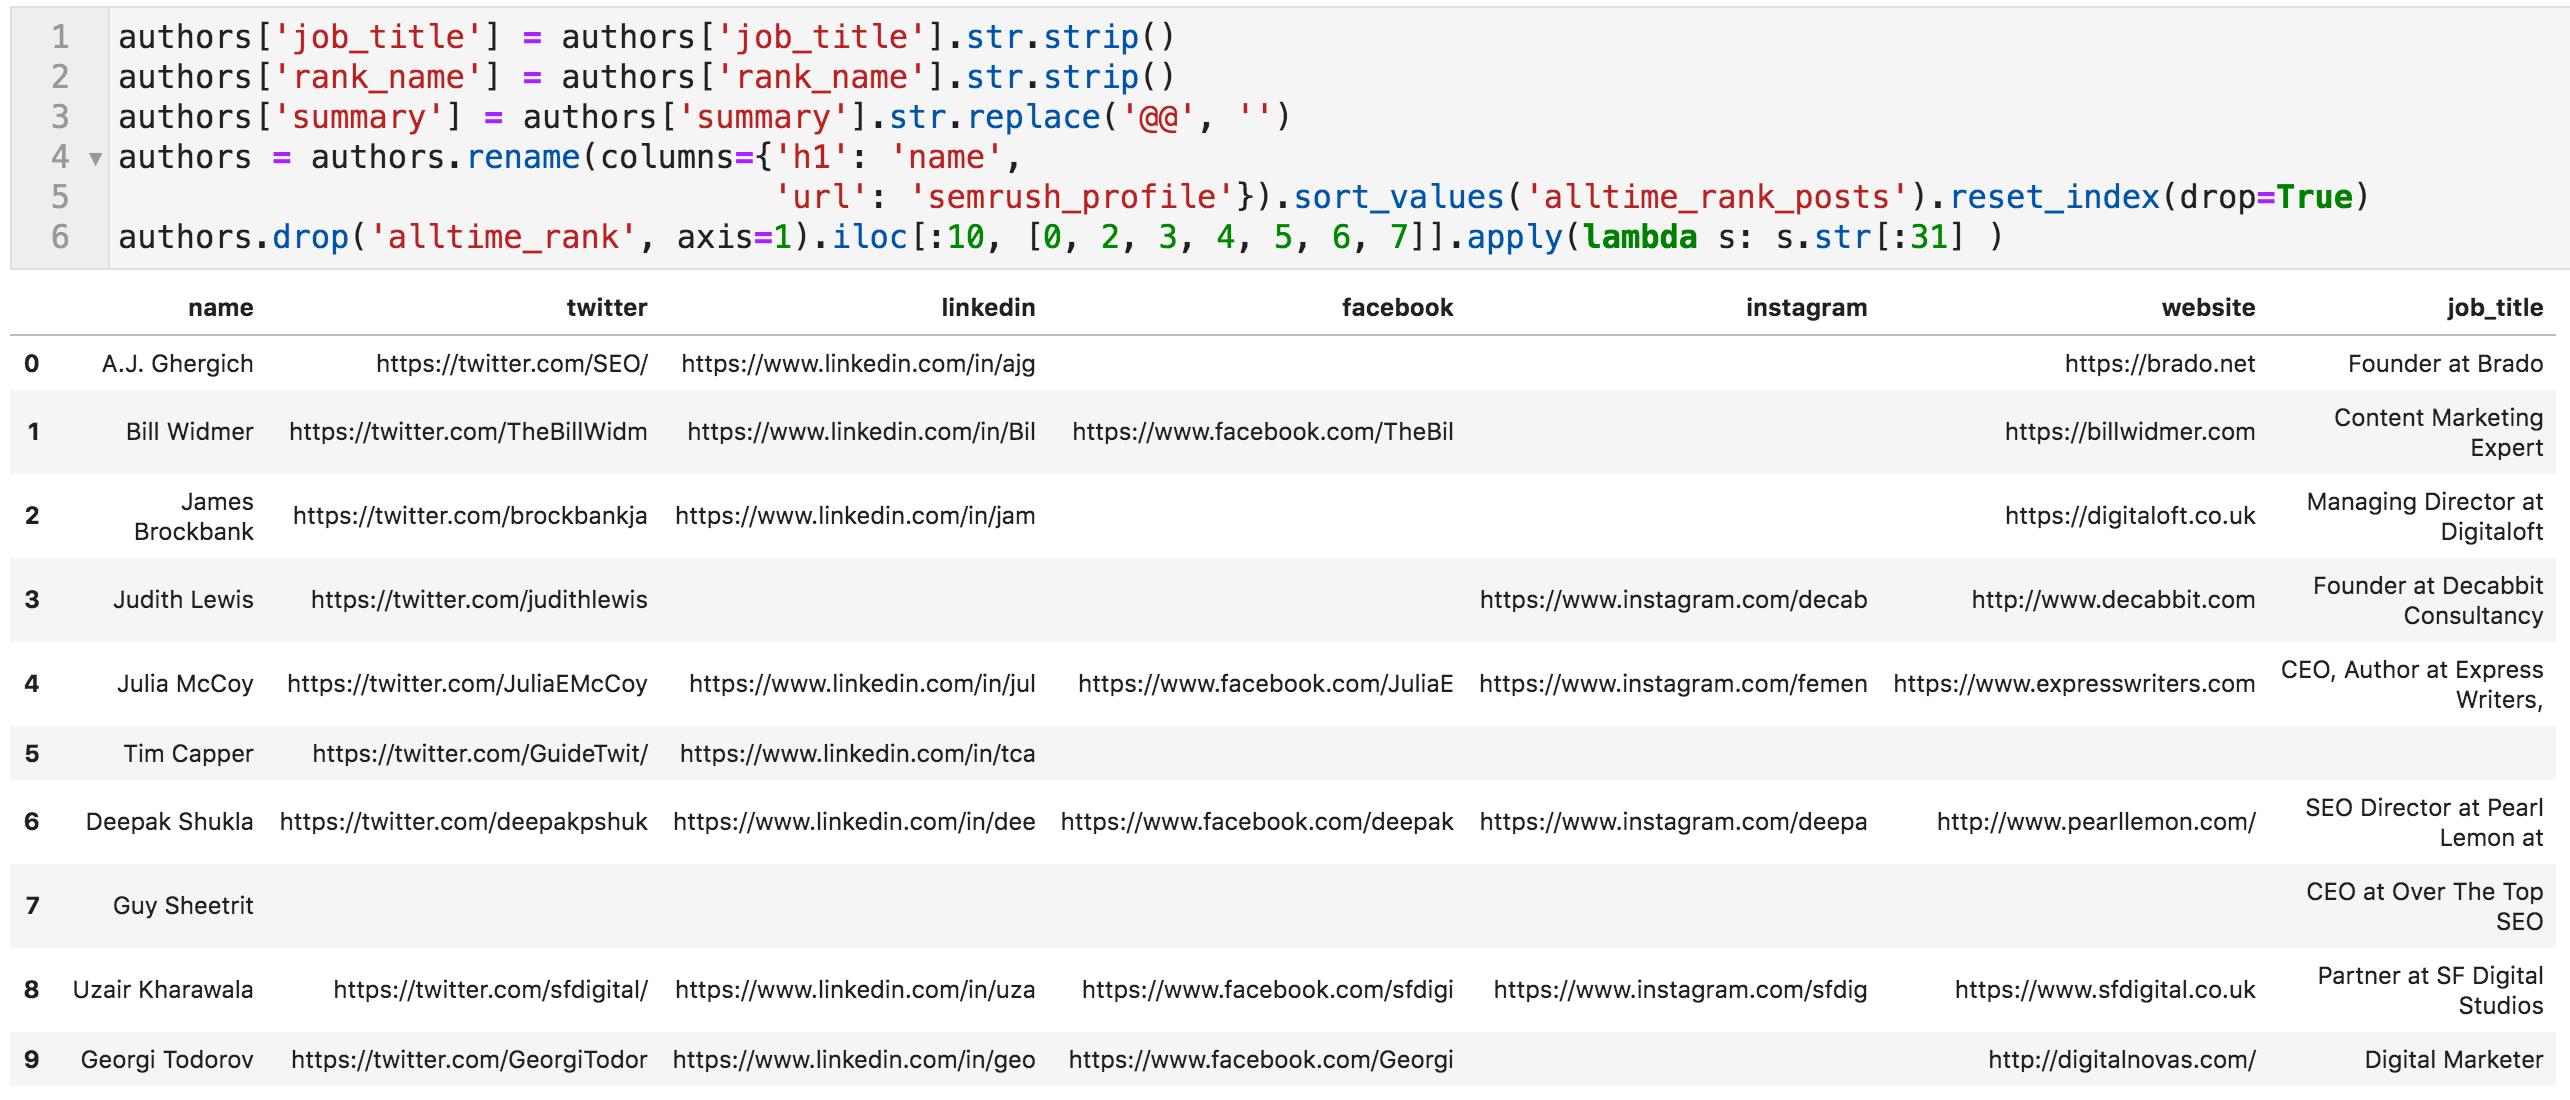 Showing python code to make final edits